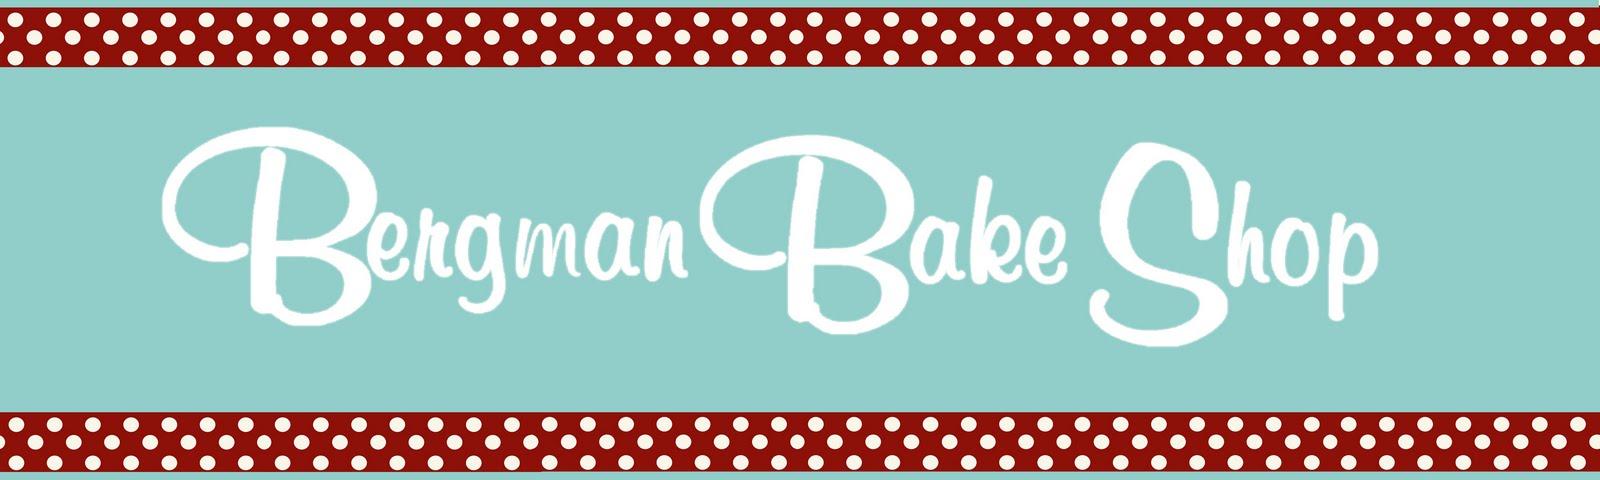 Bergman Bake Shop